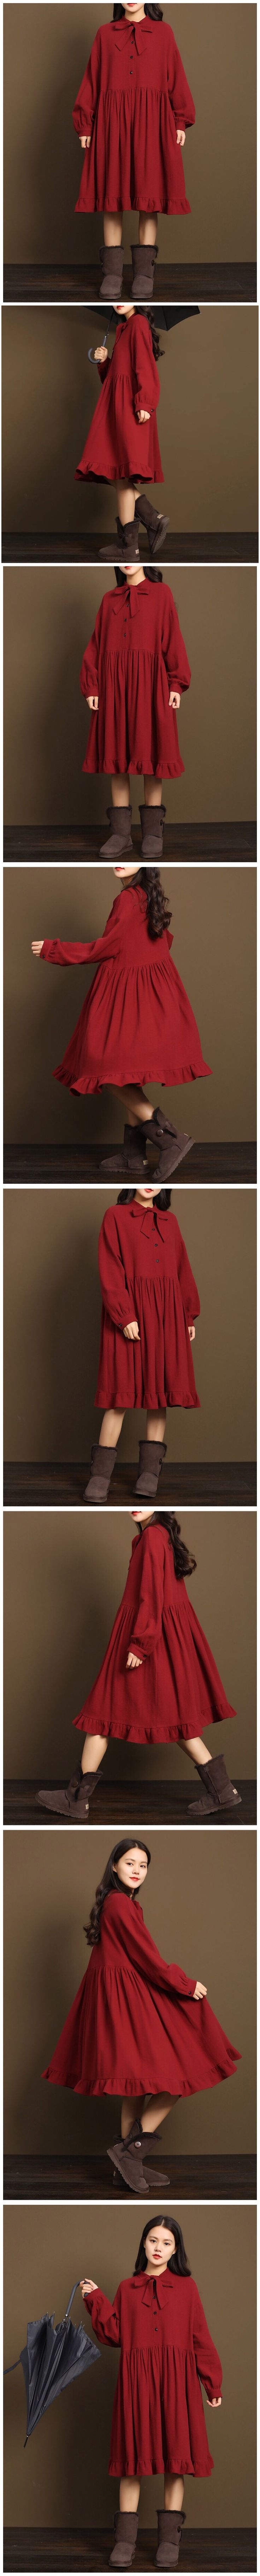 Red lovely wool dresses